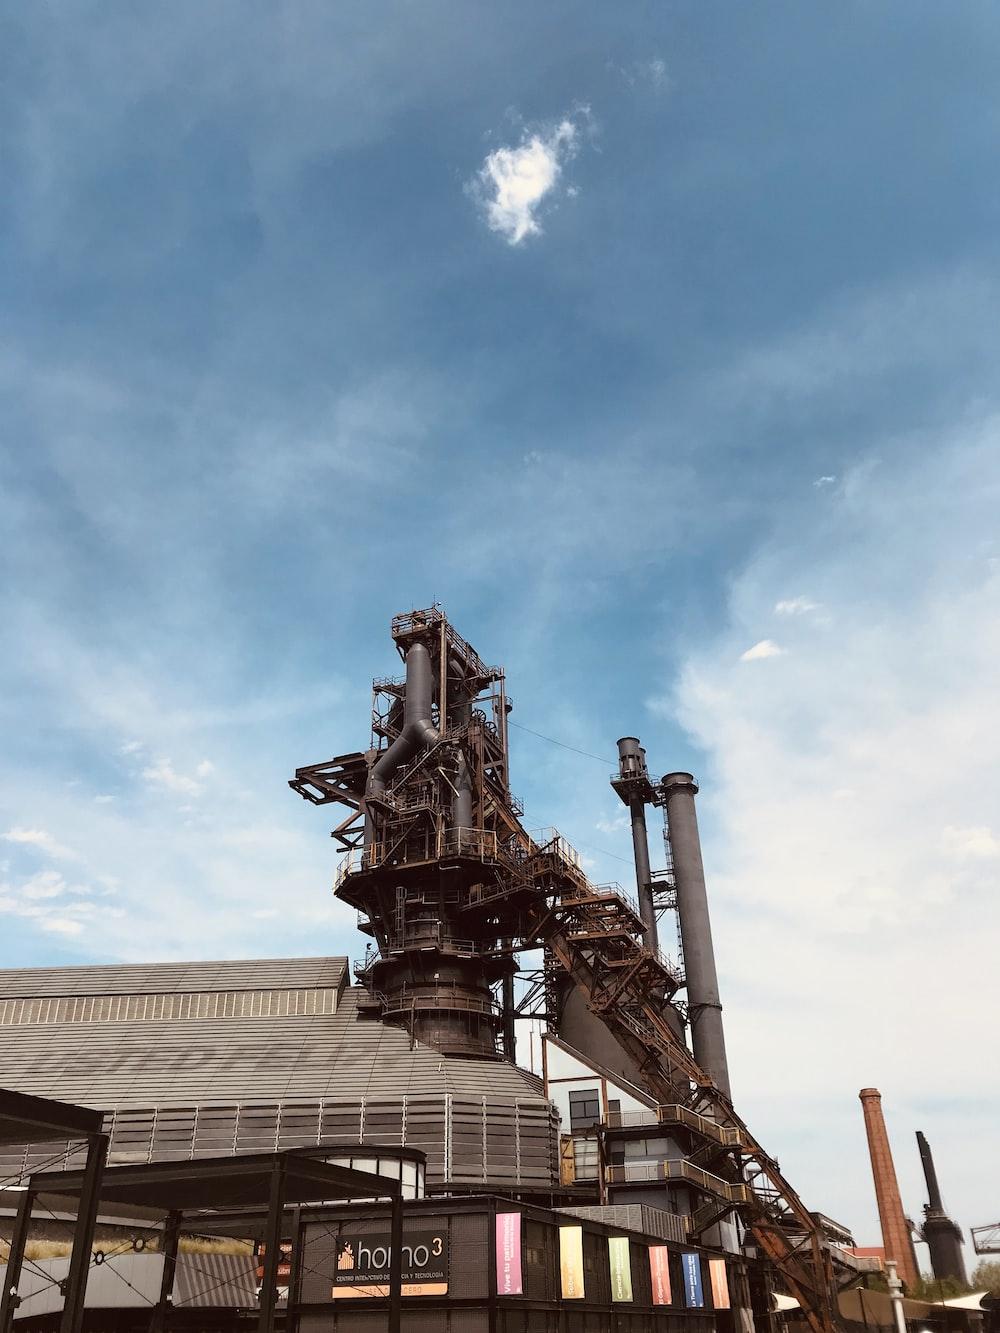 brown metal statue under blue sky during daytime